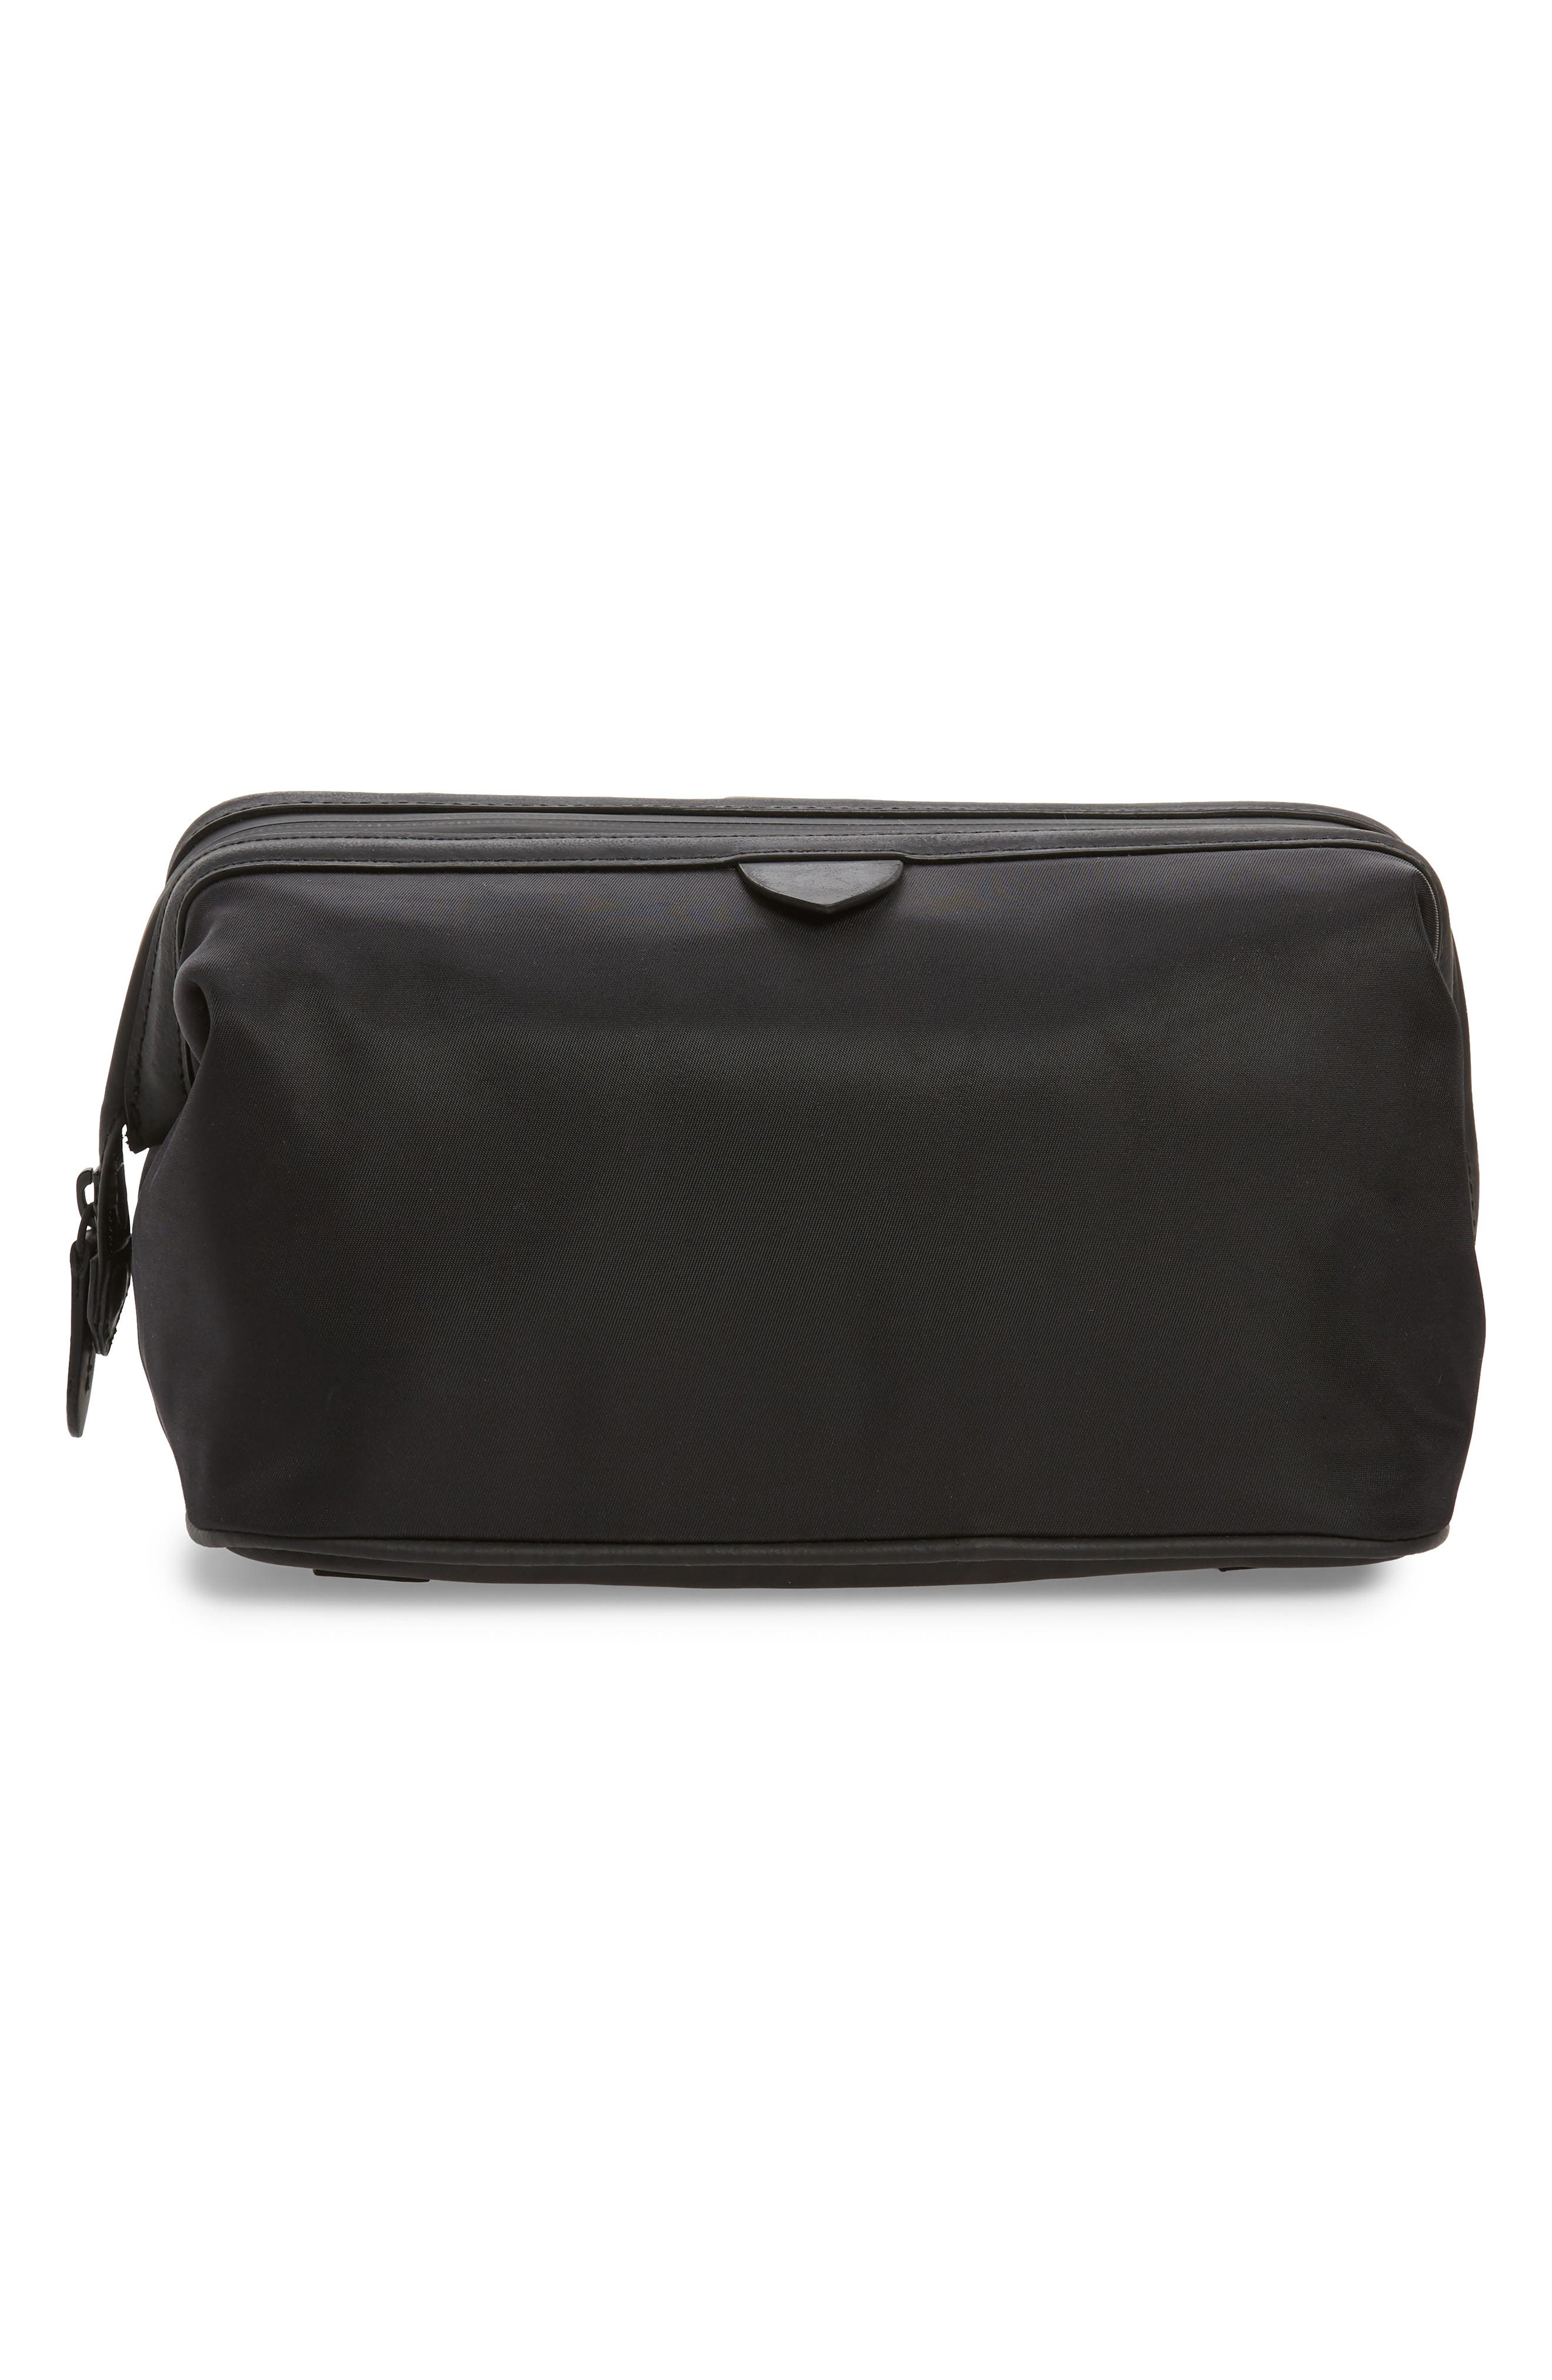 Zerogrand Toiletry Bag in Black